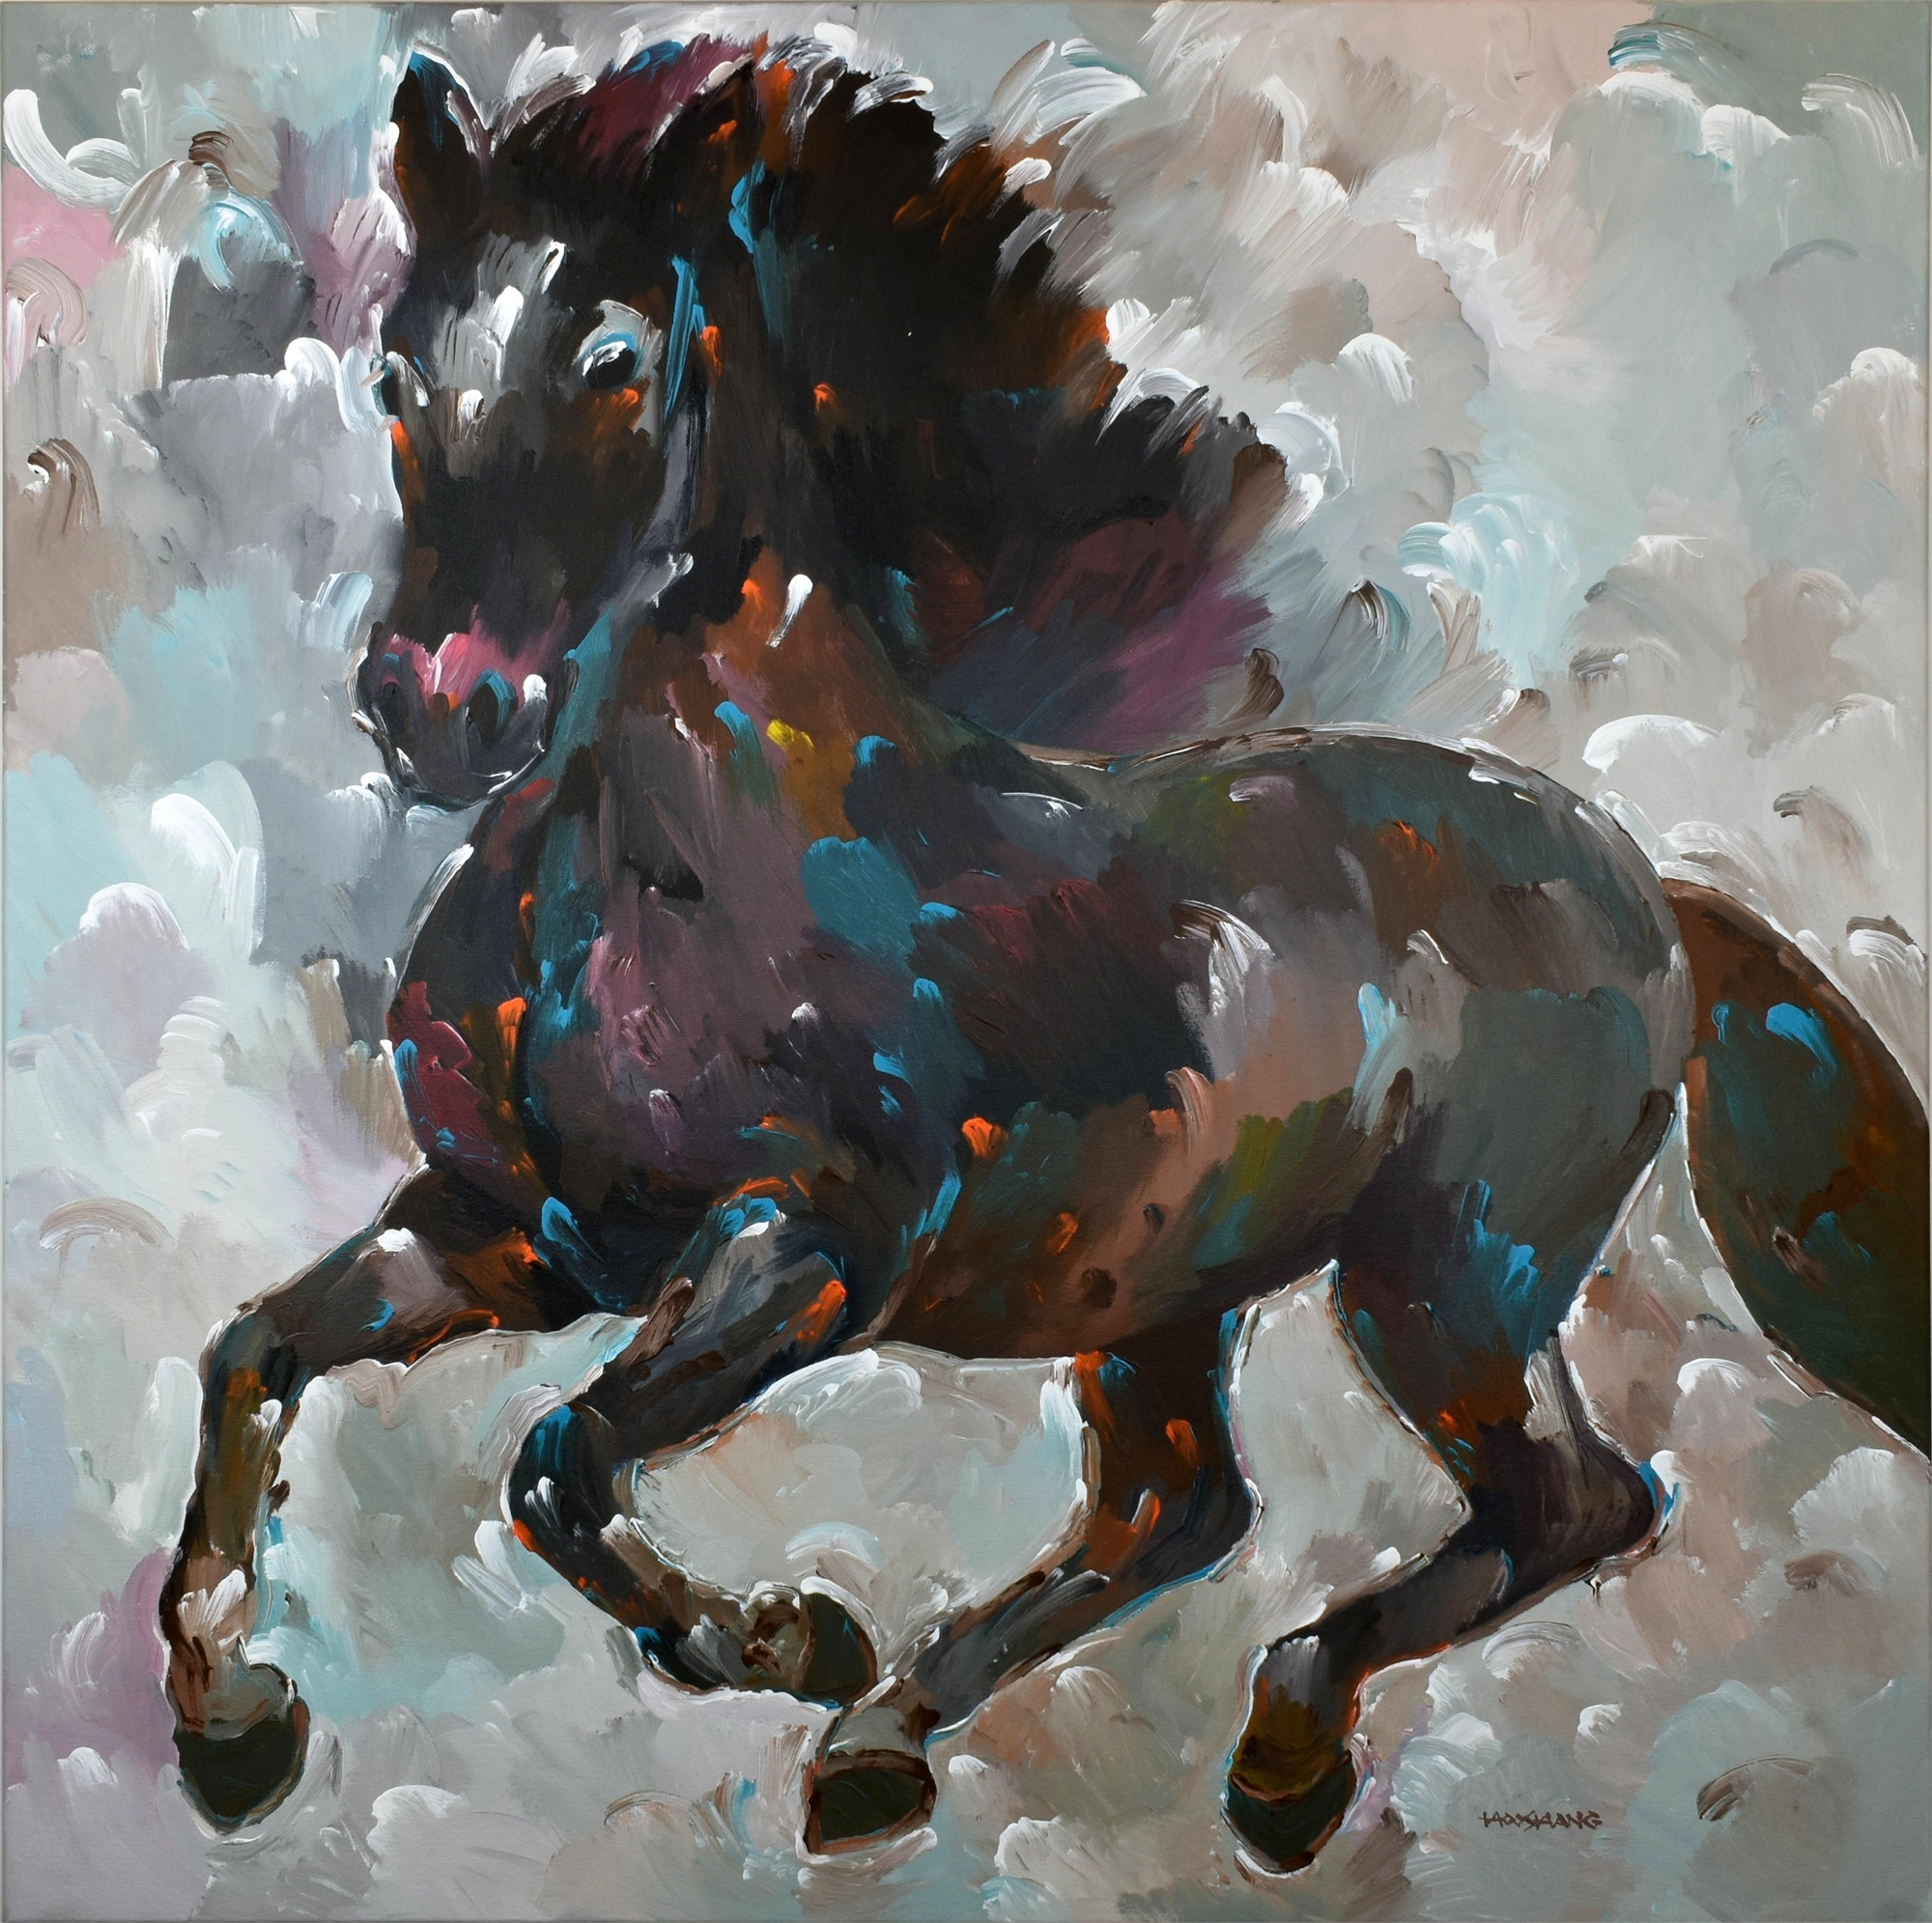 Black Thunder by Hooshang Khorasani